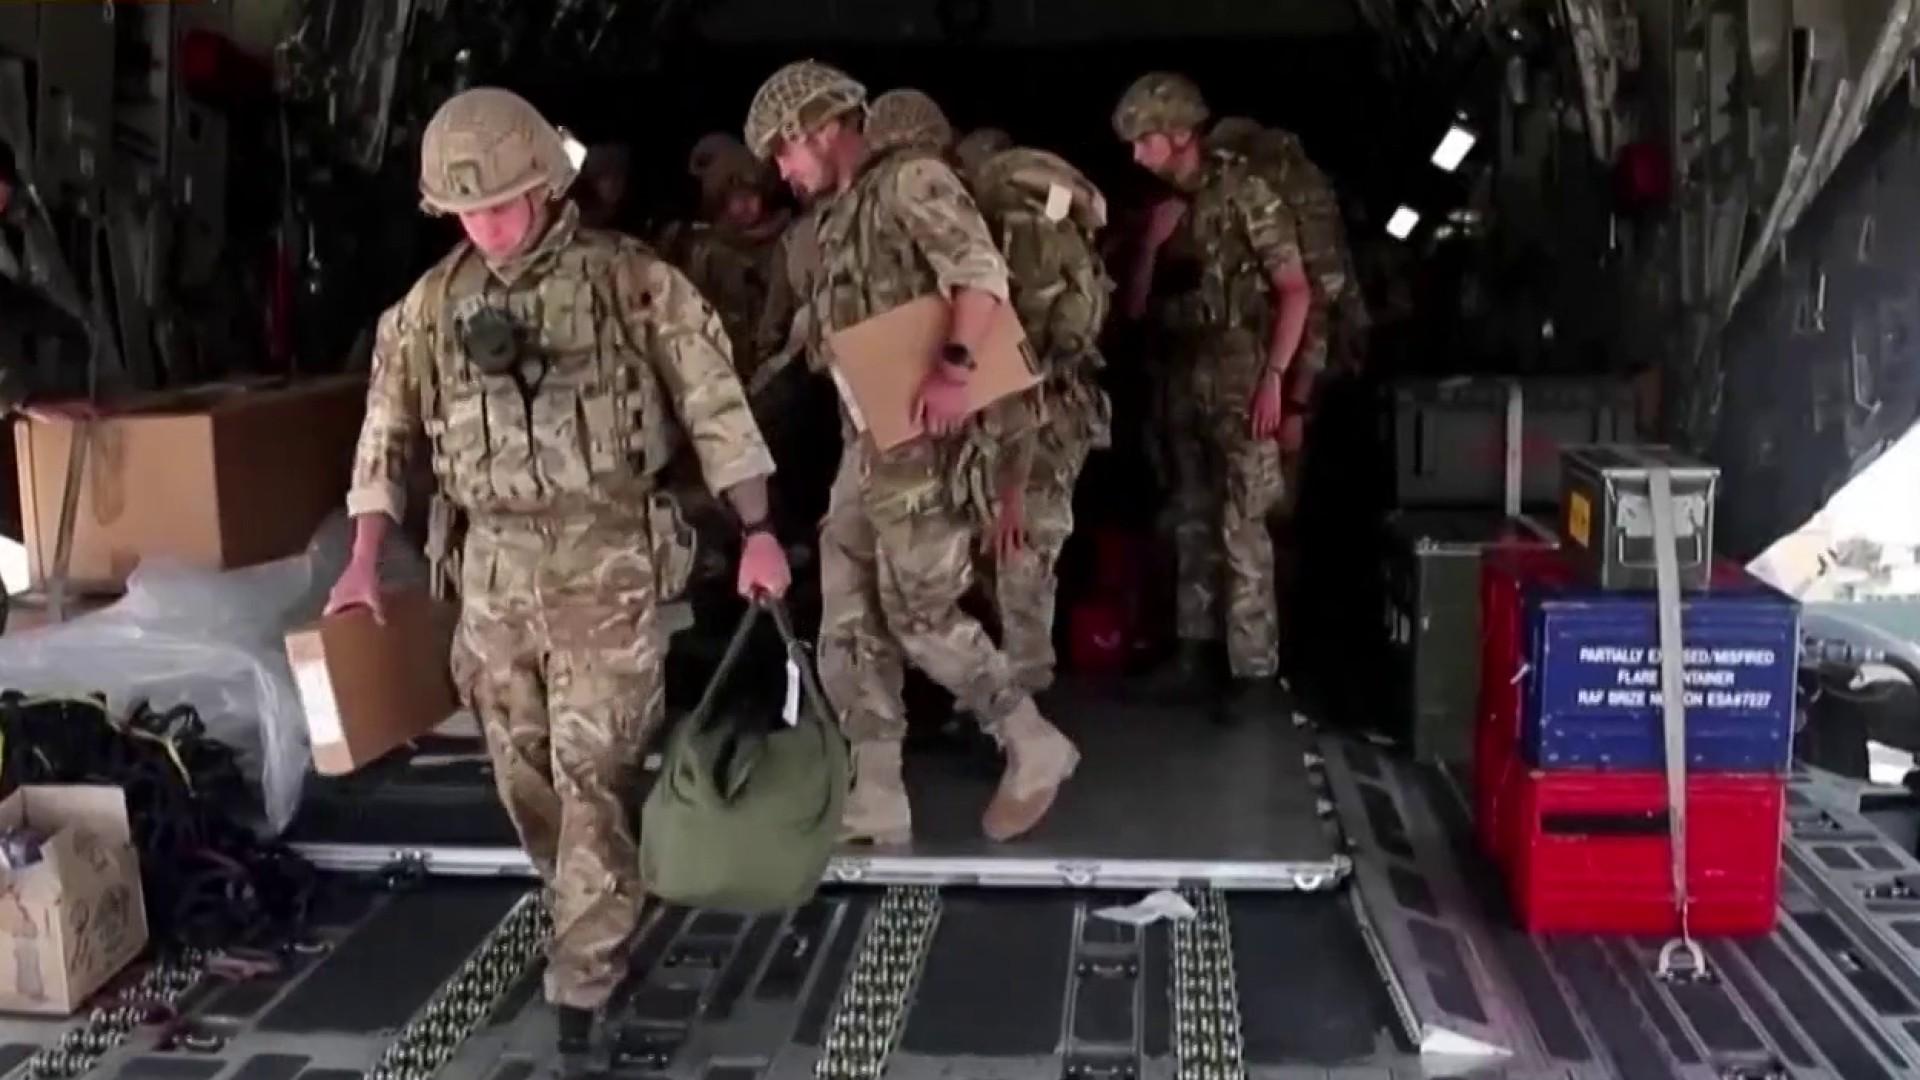 U.S. allies evacuate embassy staff in Afghanistan as Taliban gains control of Kabul